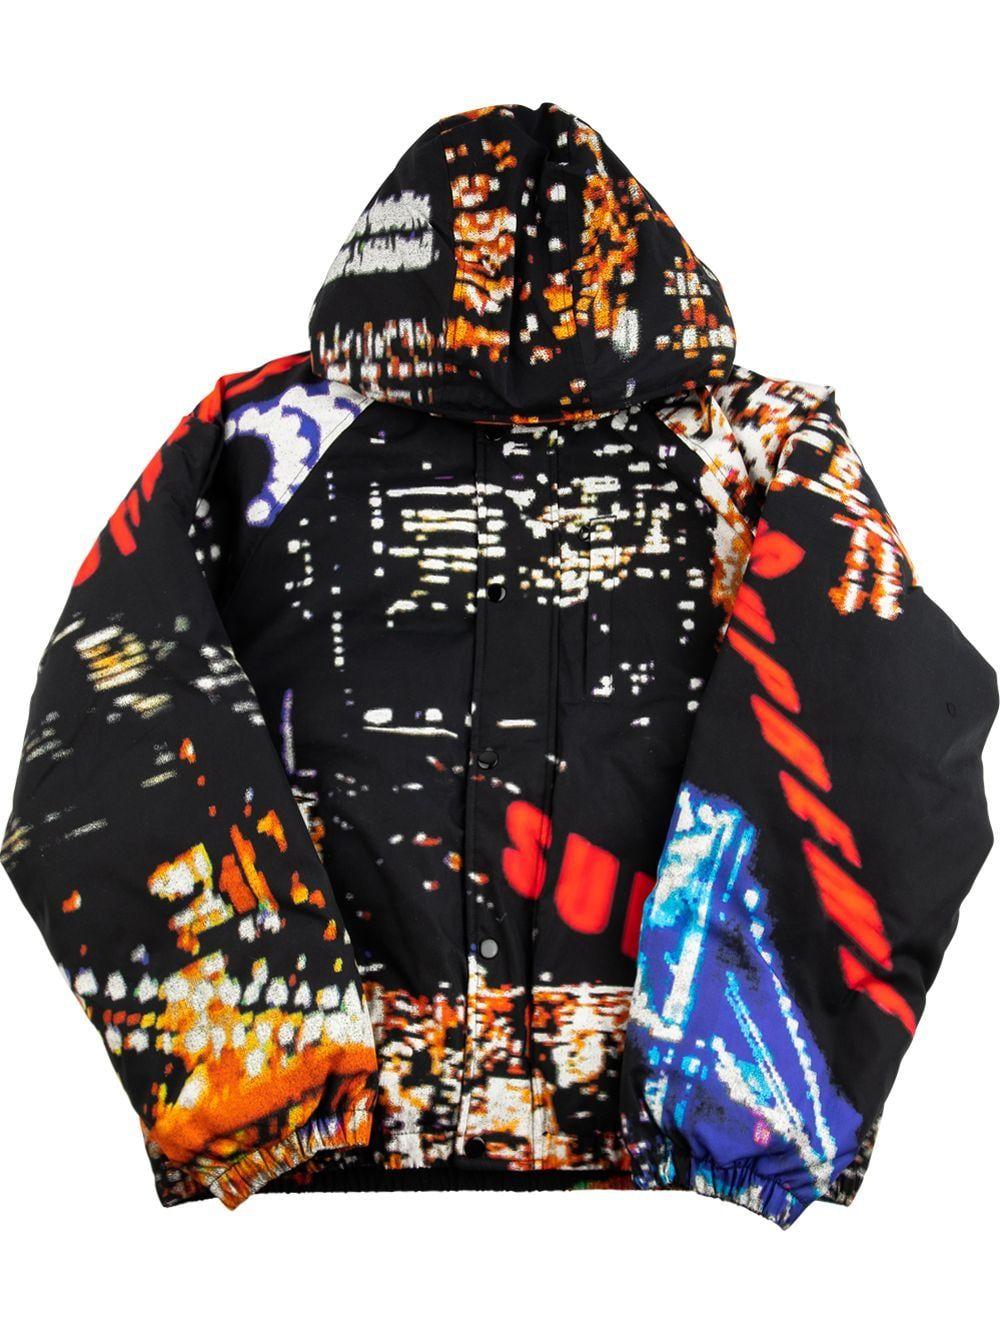 Supreme City Lights Puffer Jacket Farfetch In 2021 Puffer Jacket Black Jackets Puffer Jackets [ 1334 x 1000 Pixel ]